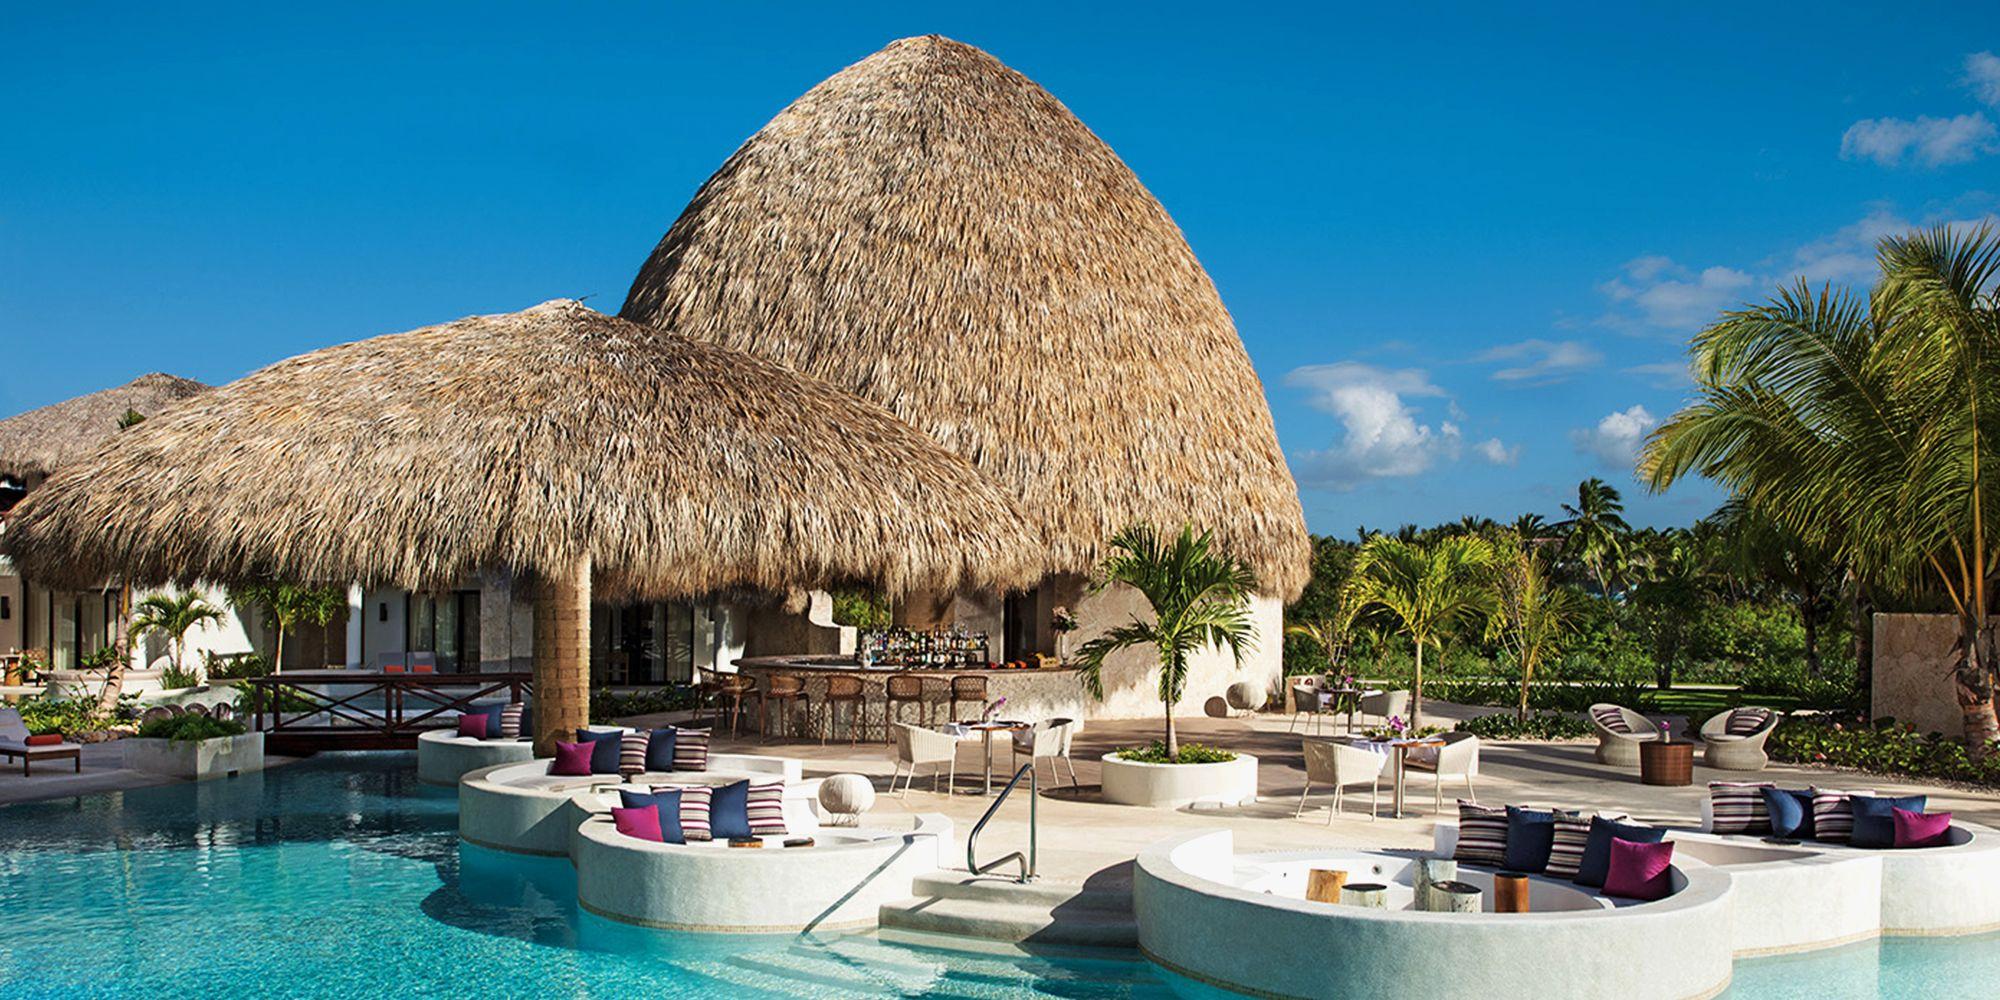 30 Best Caribbean Resorts to Visit in 2018 - Best Islands & Resorts ...